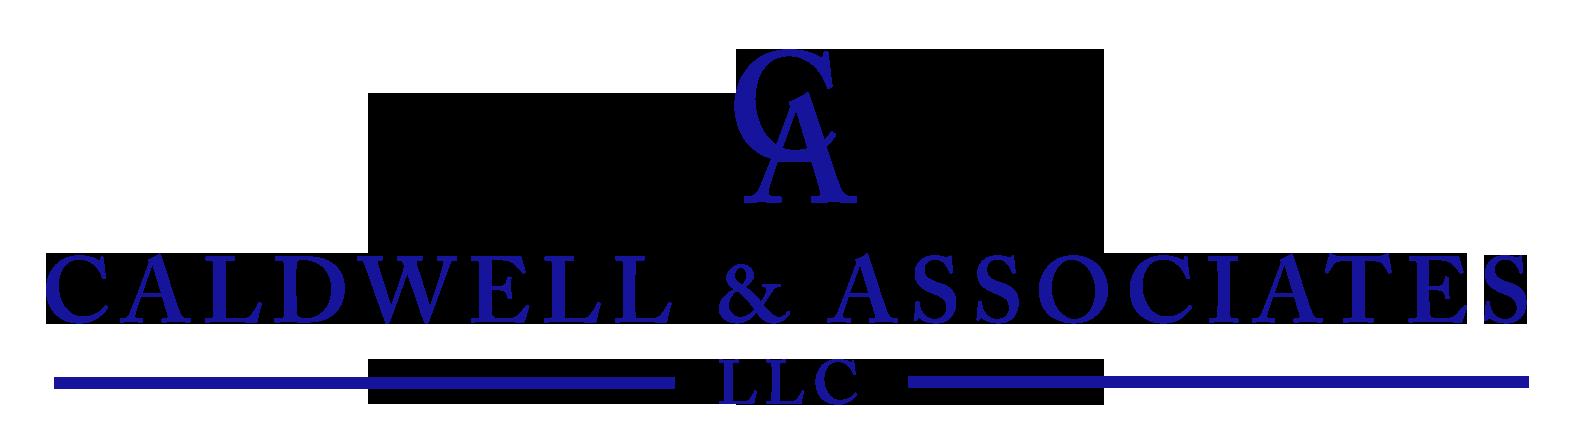 Caldwell & Associates LLC's Logo'